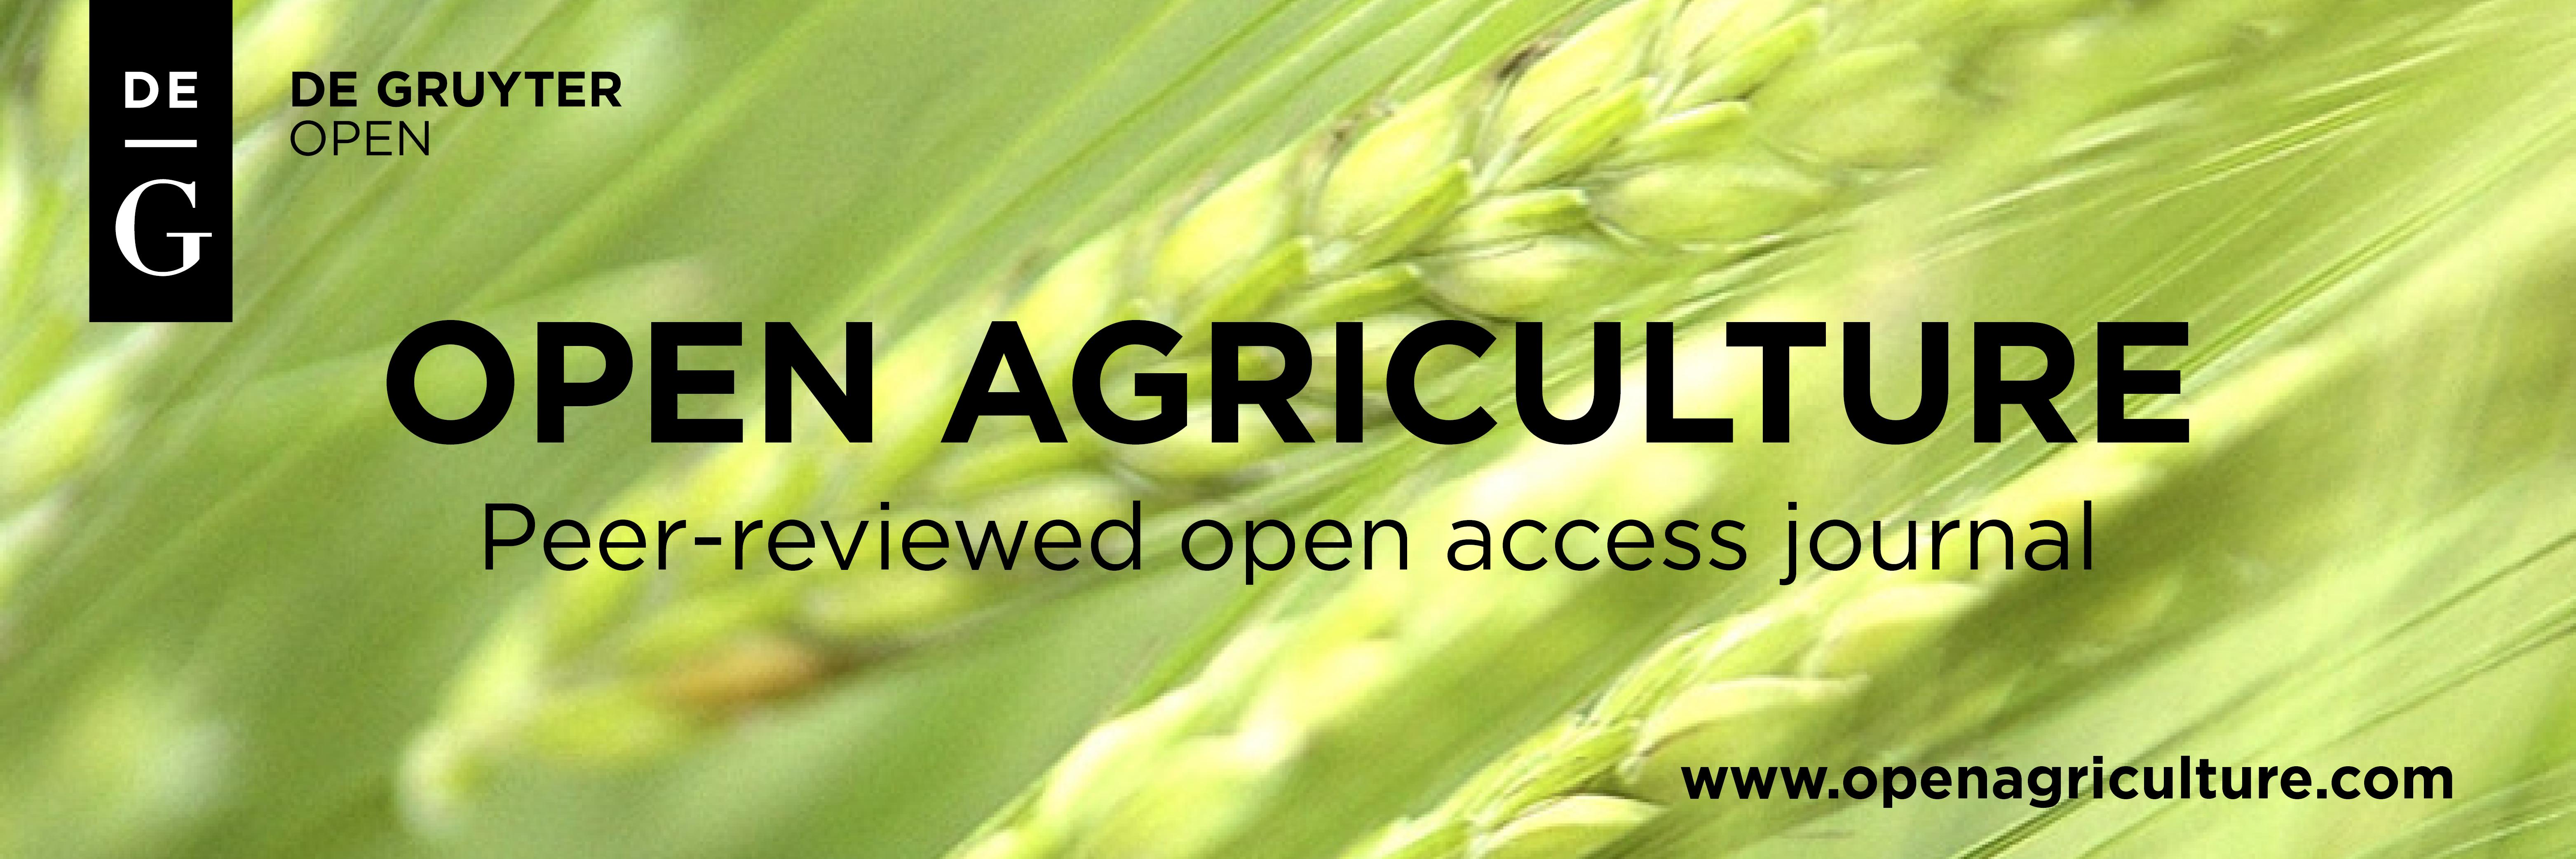 OpenAgriculture_banner.jpg